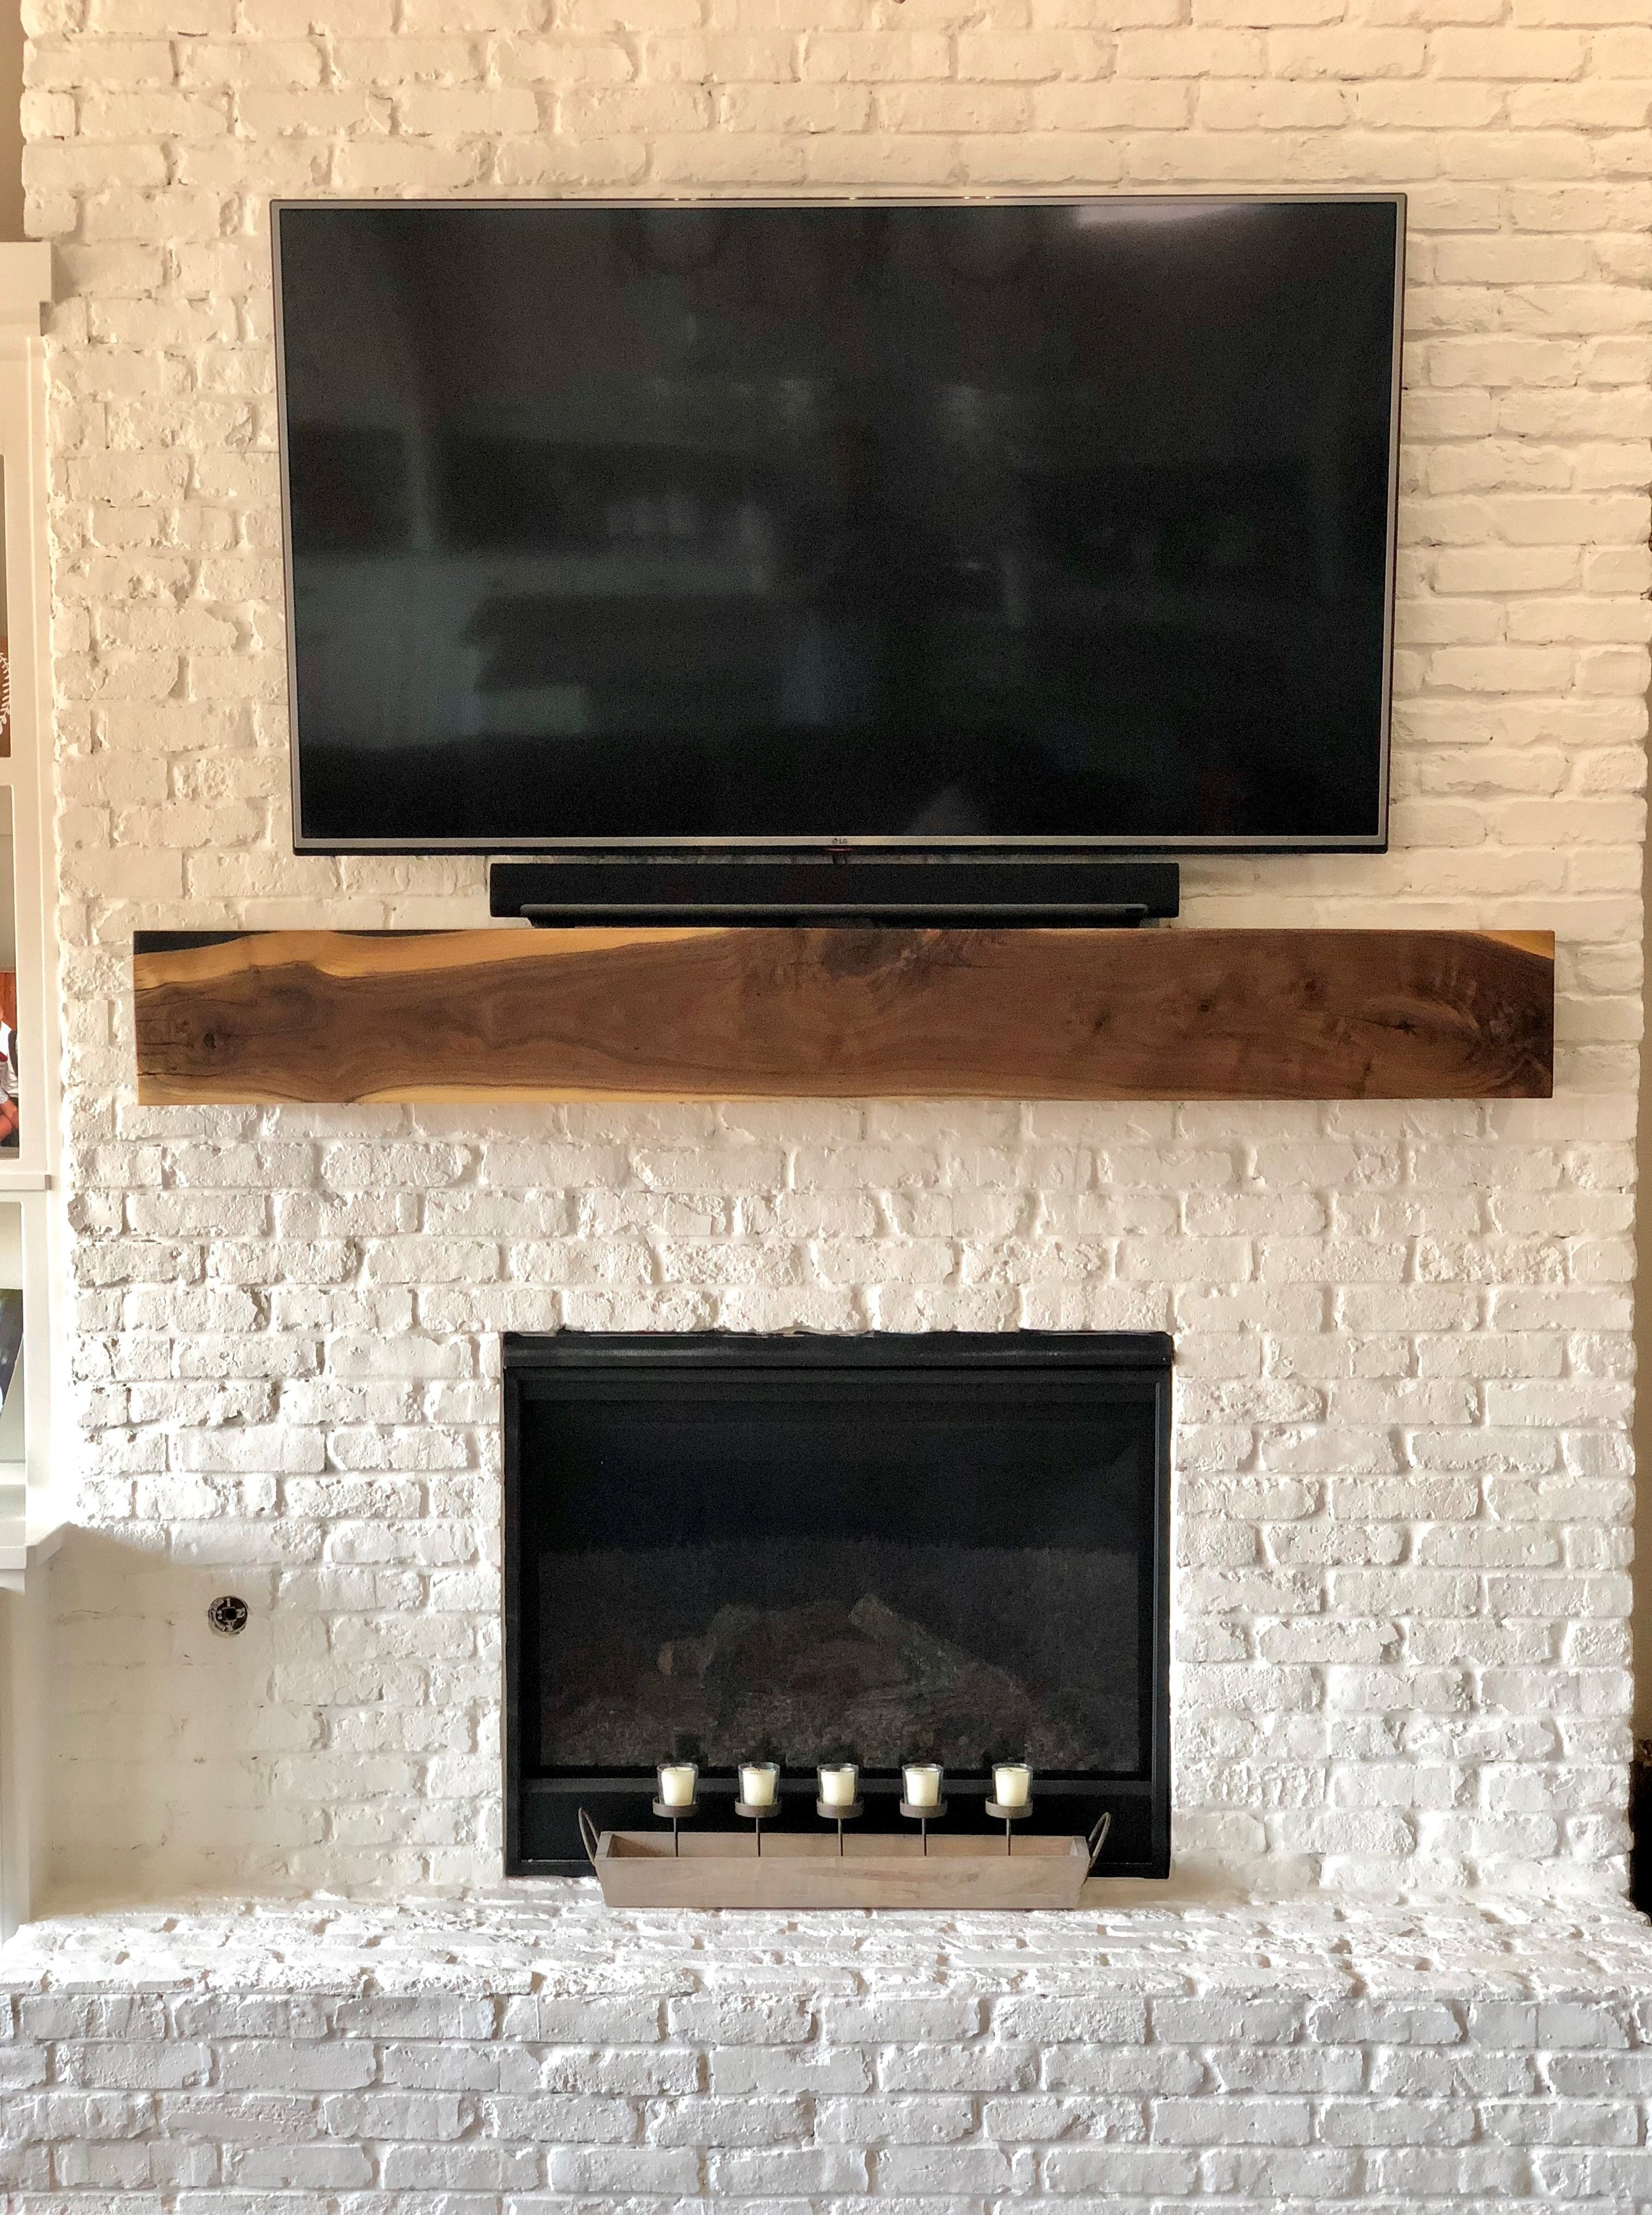 Brick Fireplace & Mantle.jpg